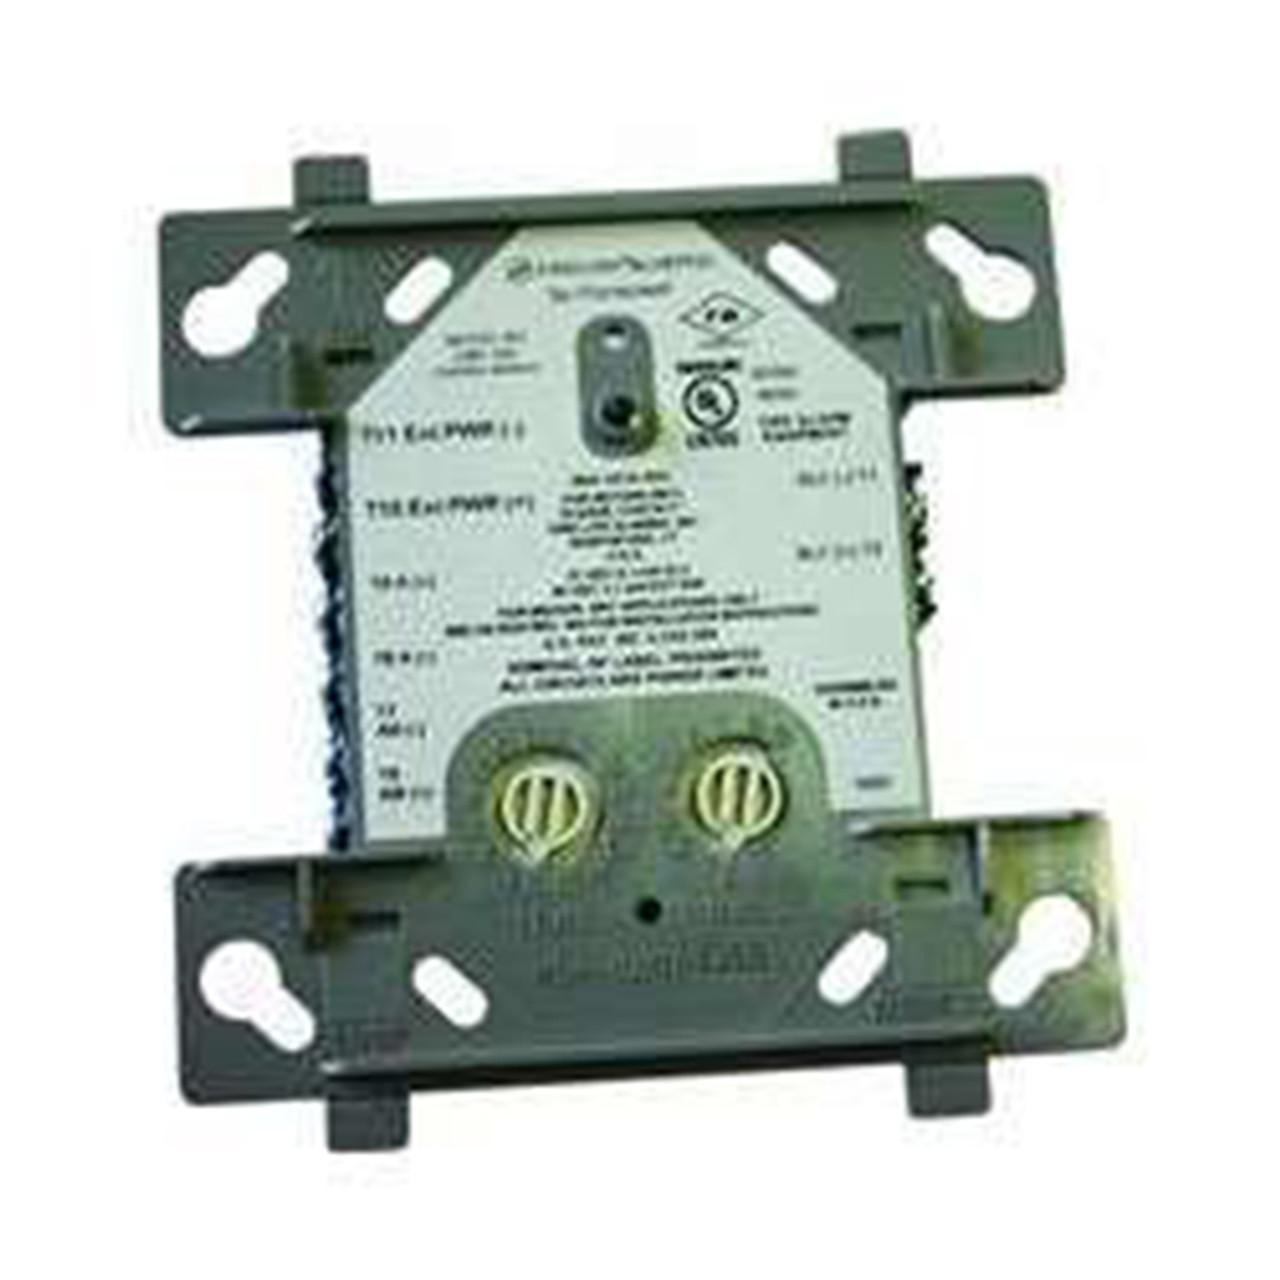 FIRE-LITE Fire-Lite CMF-300 Addressable Control Module